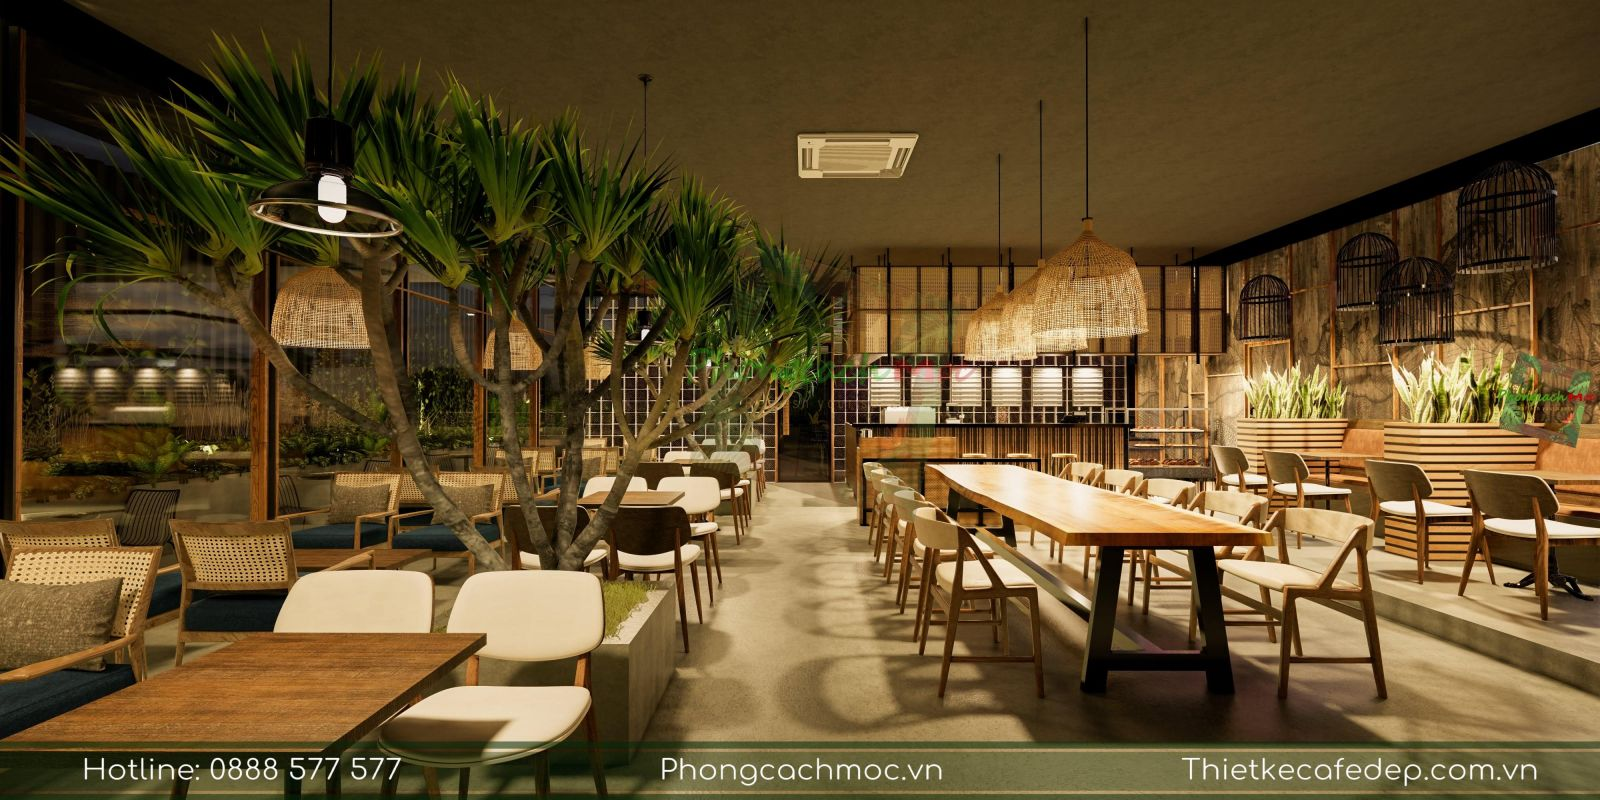 Anh-Sieu-Vung-Tau-Thiet-Ke-Quan-Cafe-San-Vuon-2